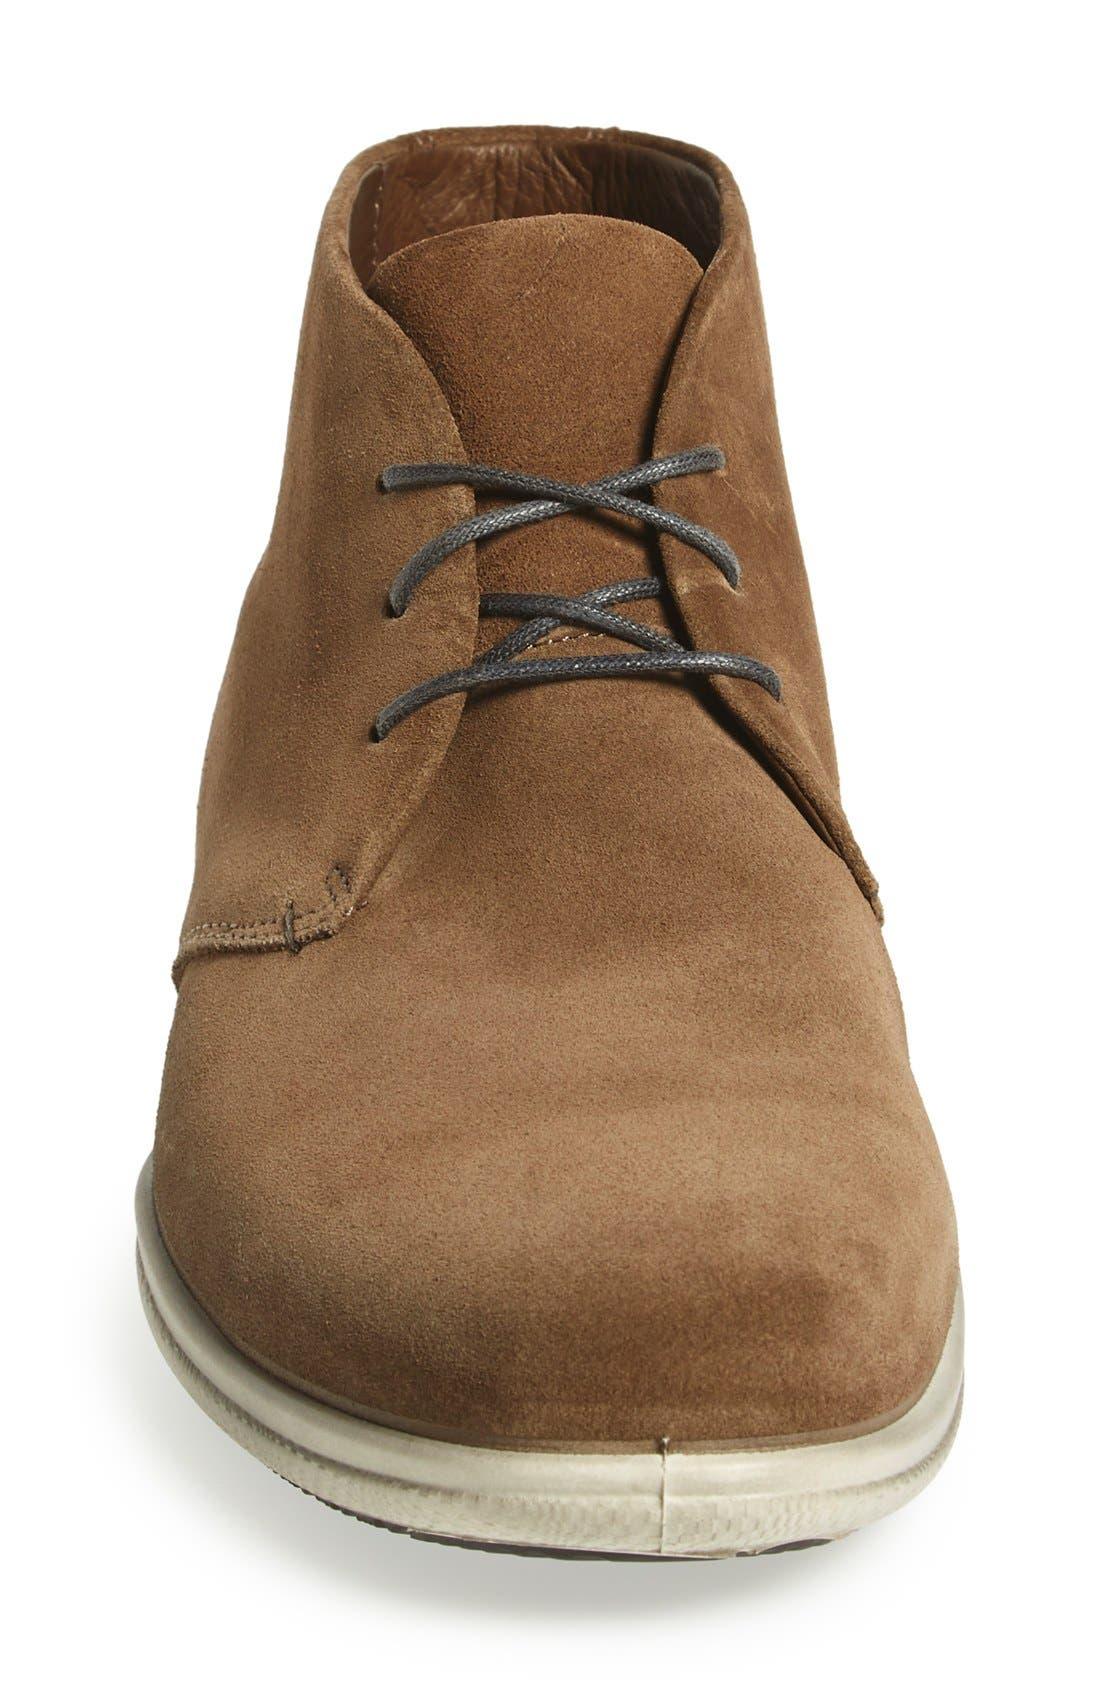 'Grenoble' Chukka Boot,                             Alternate thumbnail 3, color,                             Birch Leather